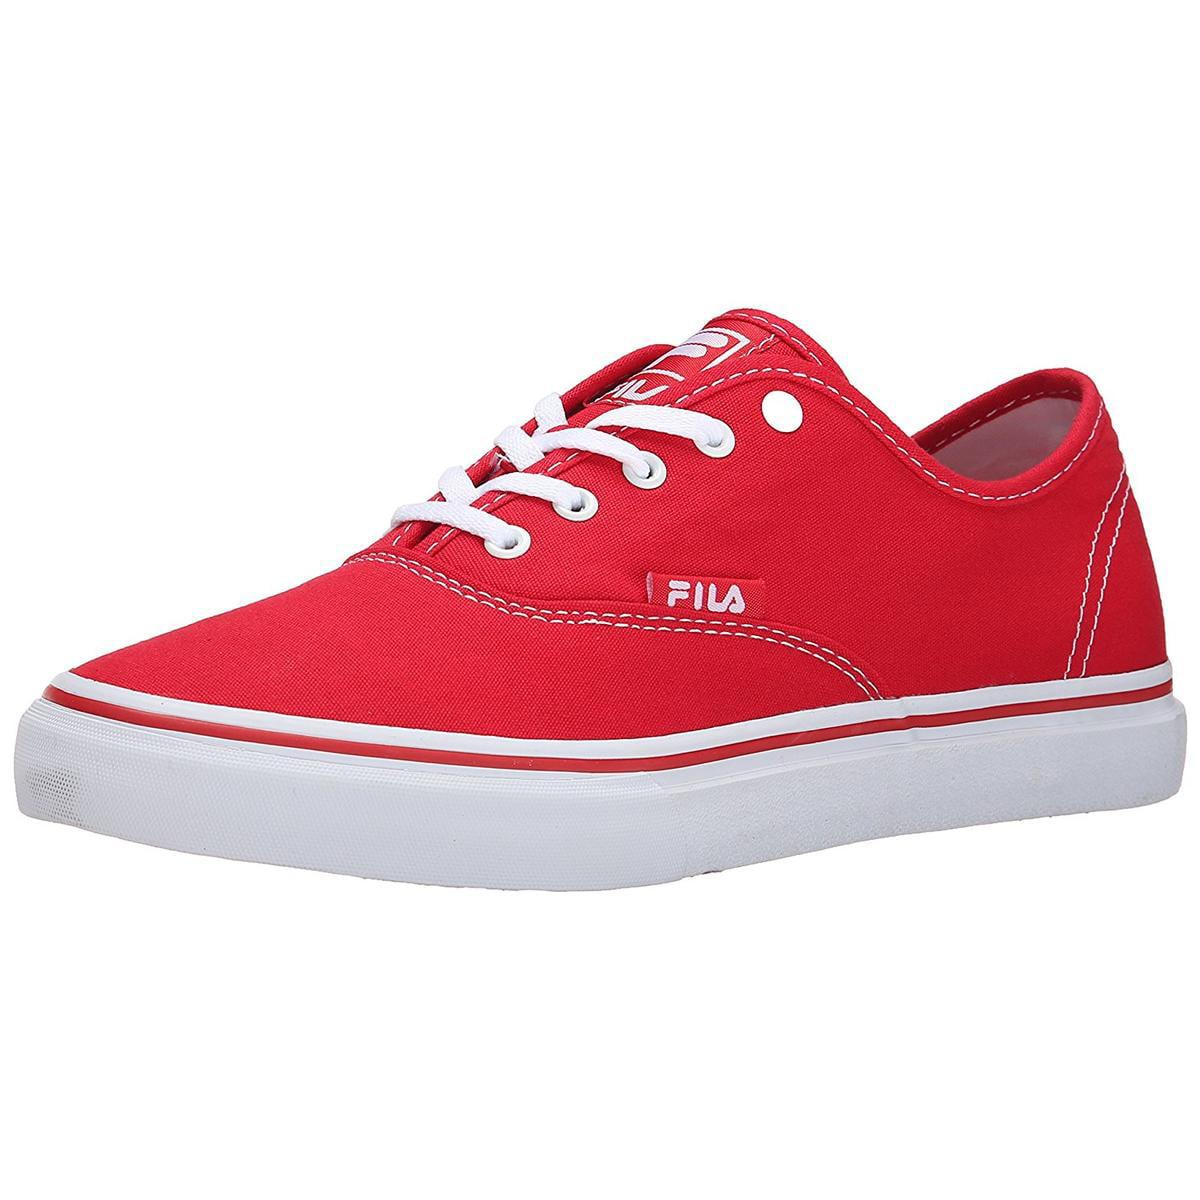 Fila Classic Men's Red White Canvas Shoe by Fila